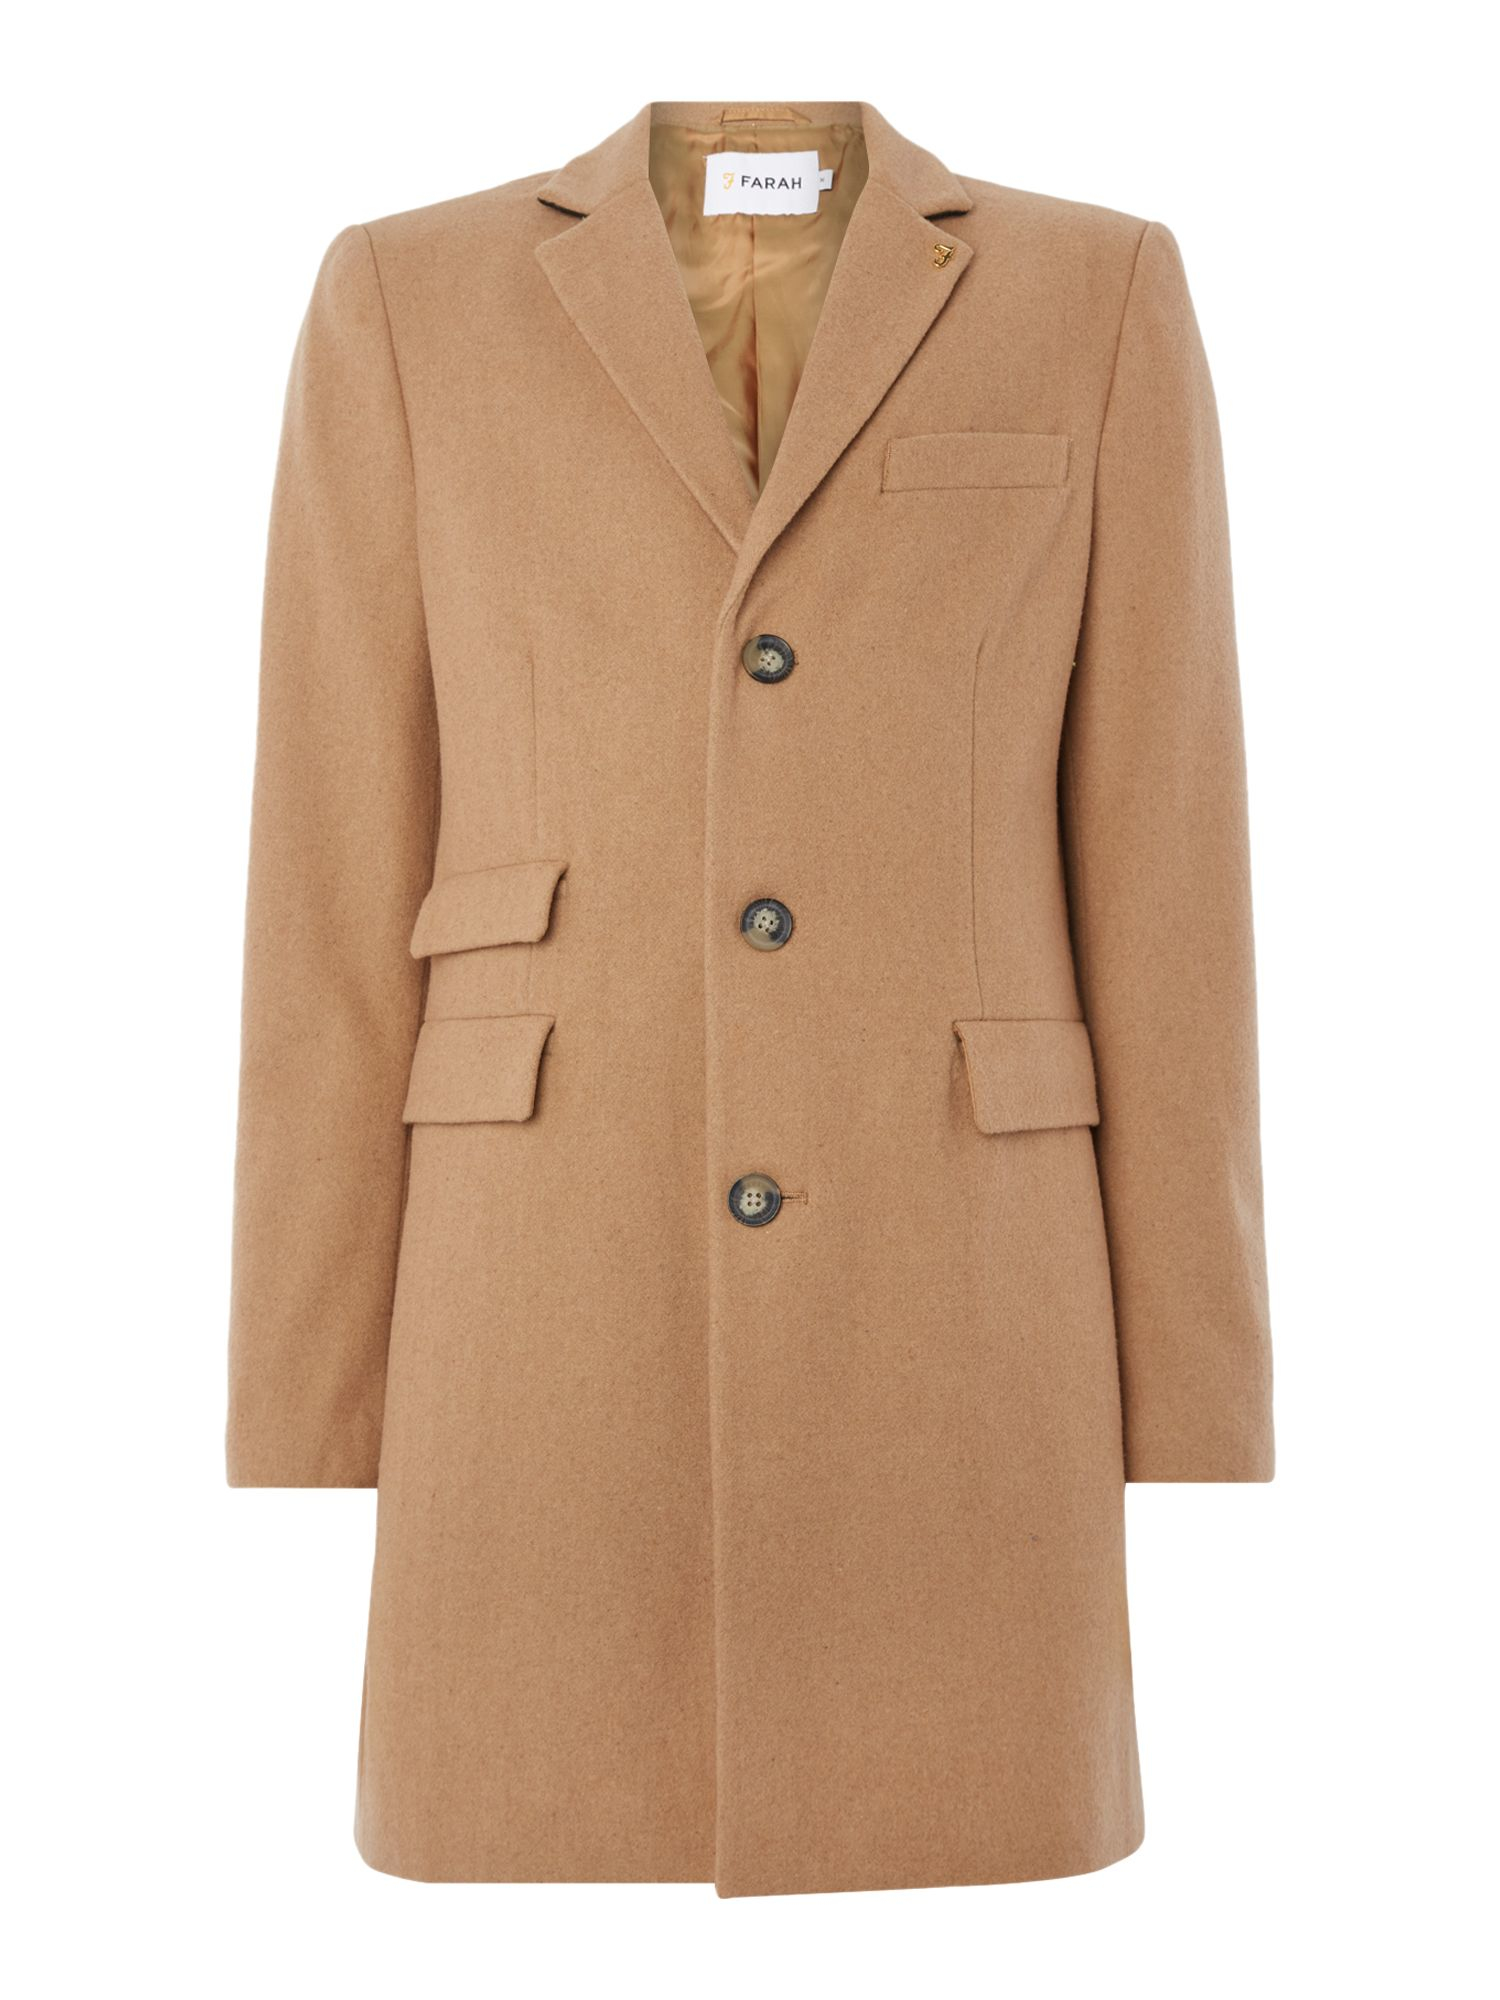 Wool blend overcoat